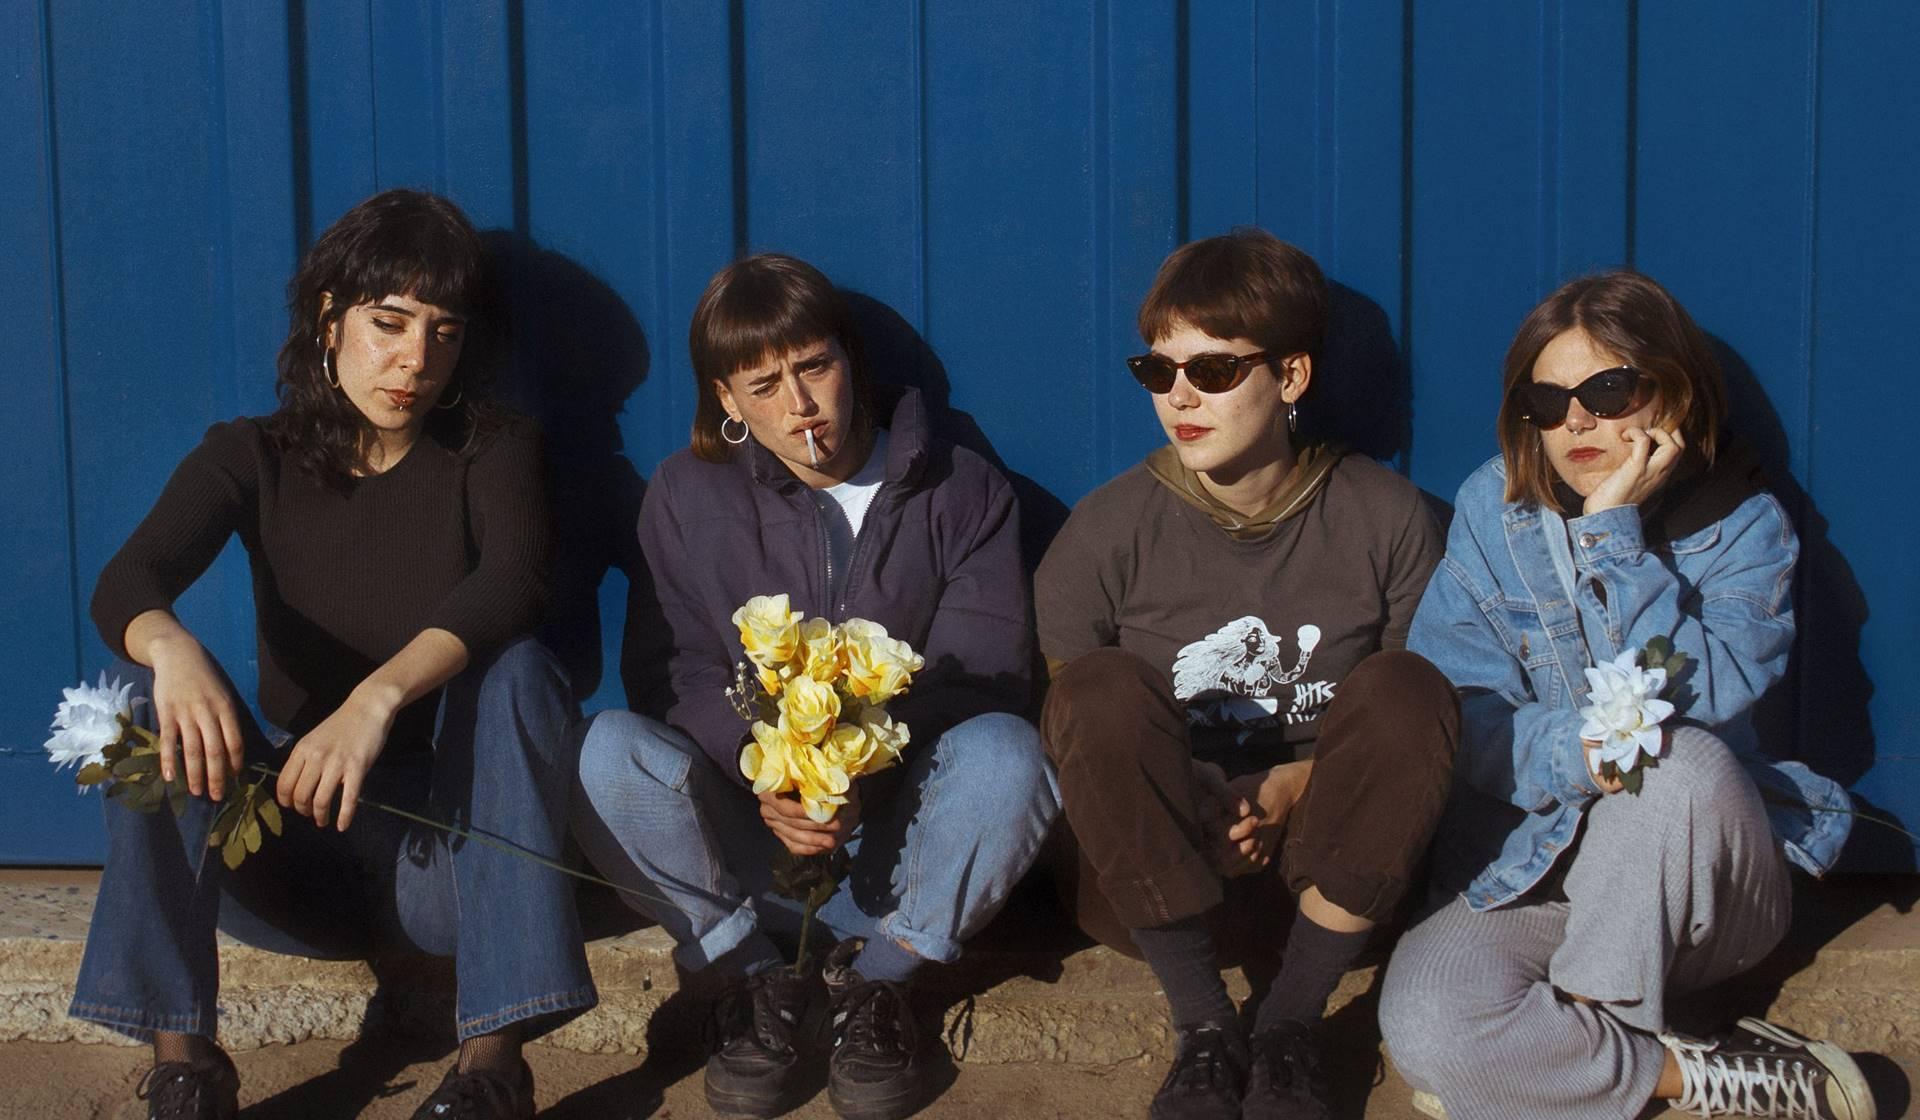 La banda valenciana Lisasinson